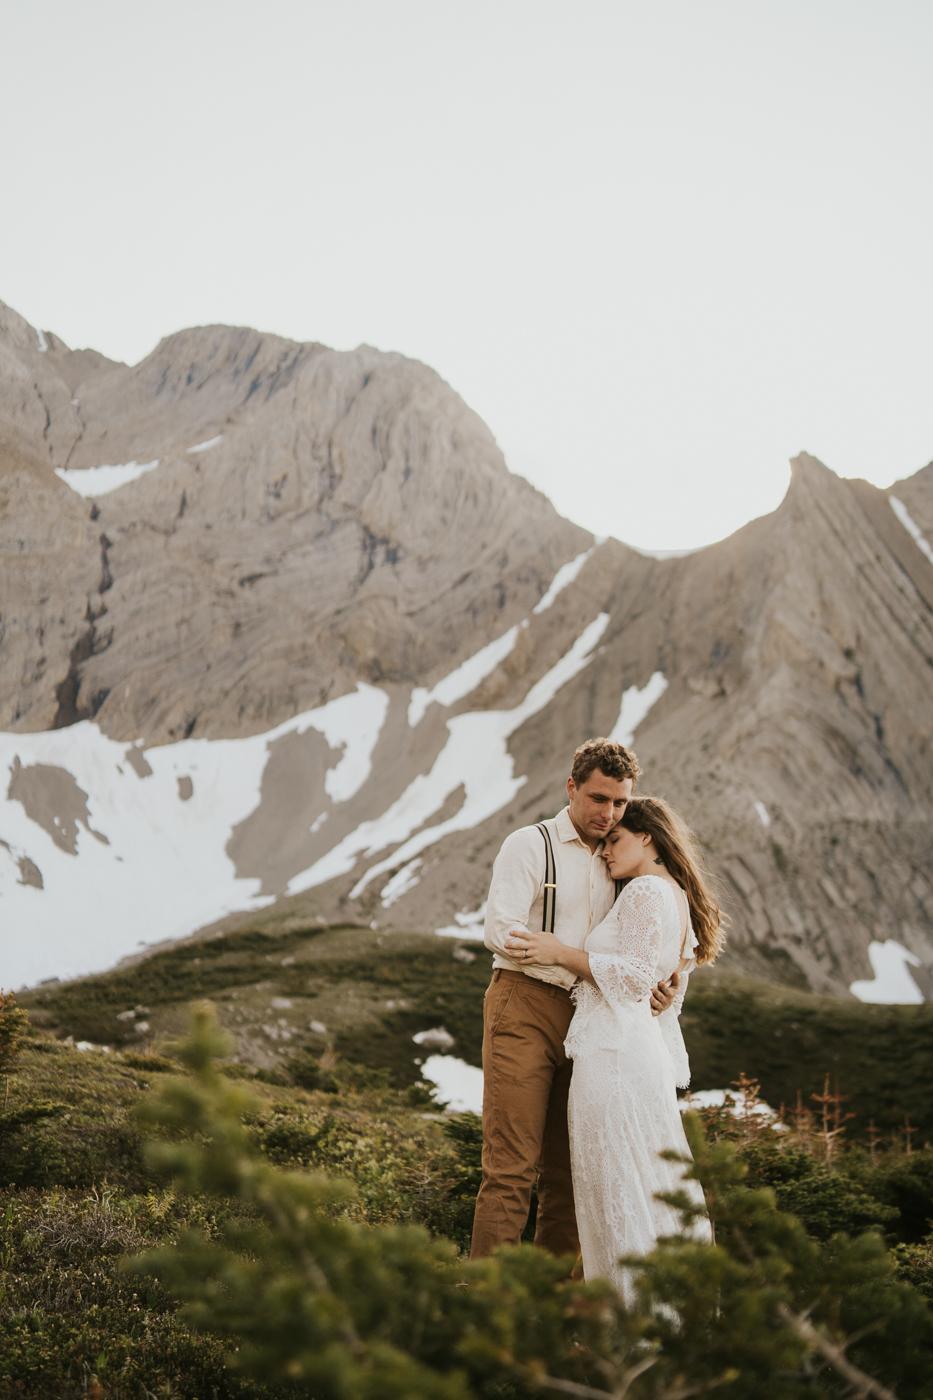 tyraephotography_photographer_wedding_elopement_engagement_photography-07994.jpg